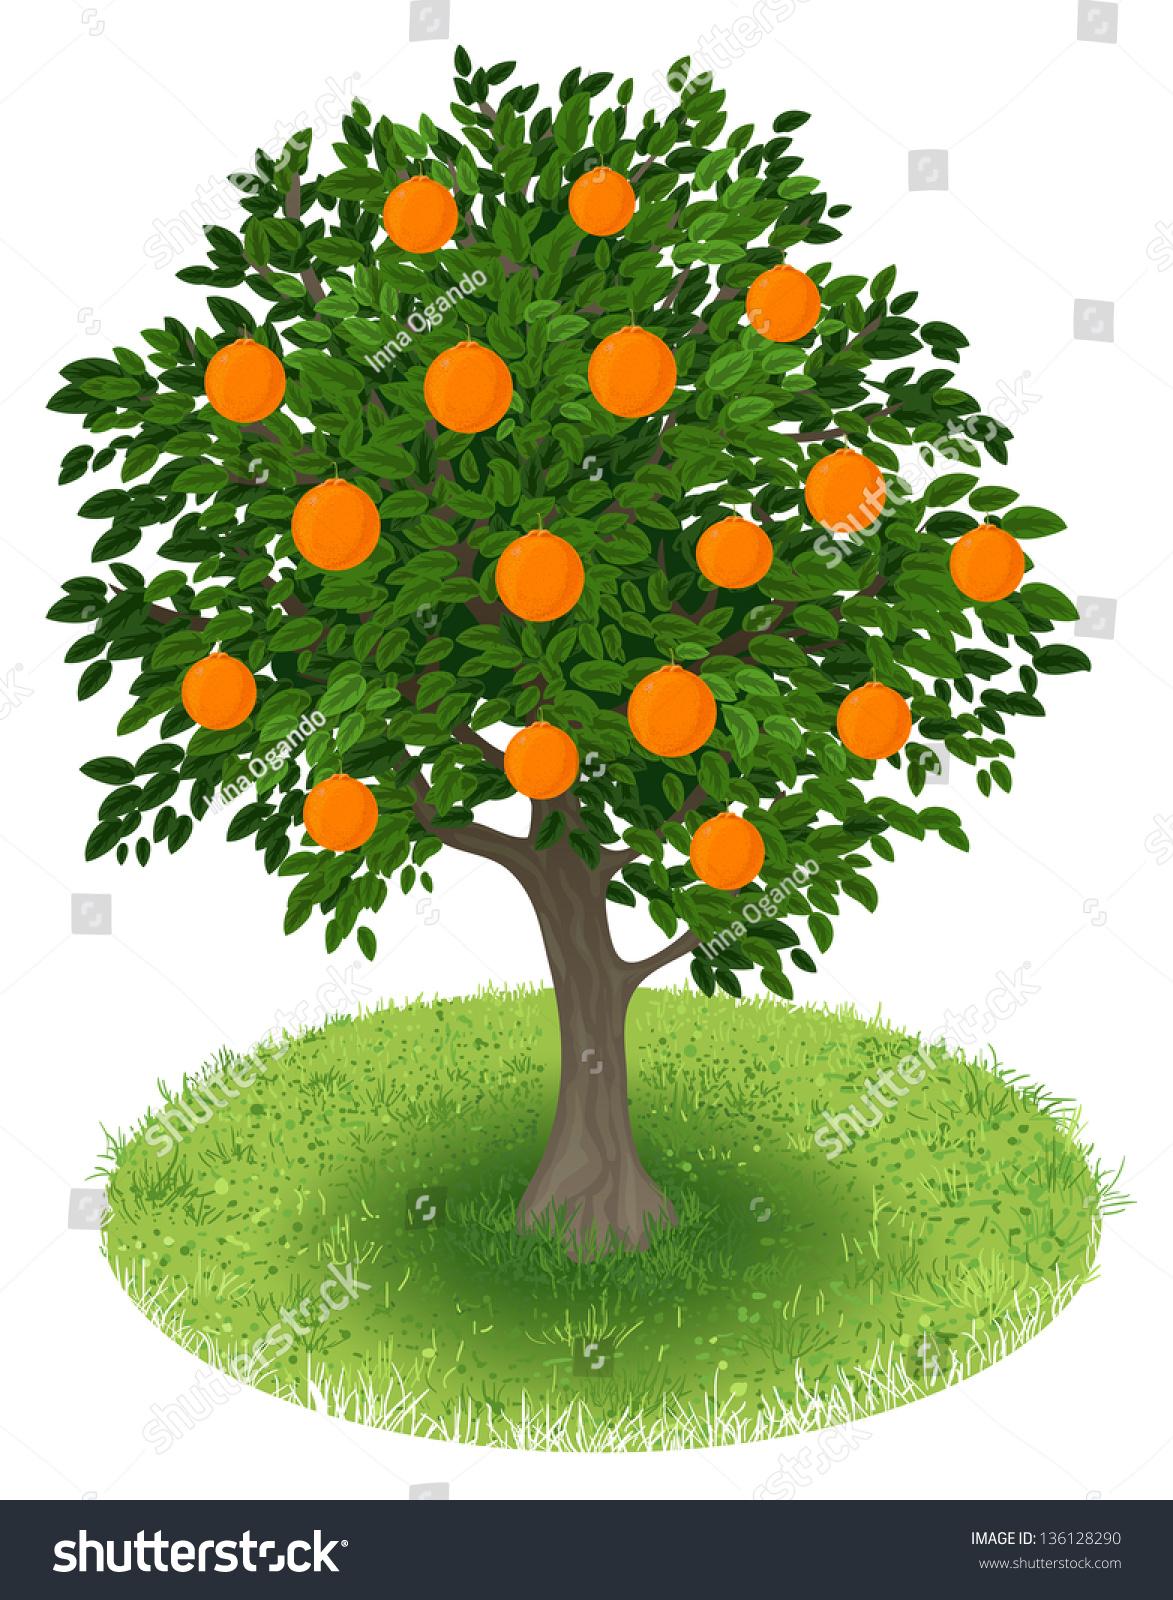 free fruit tree clipart - photo #43